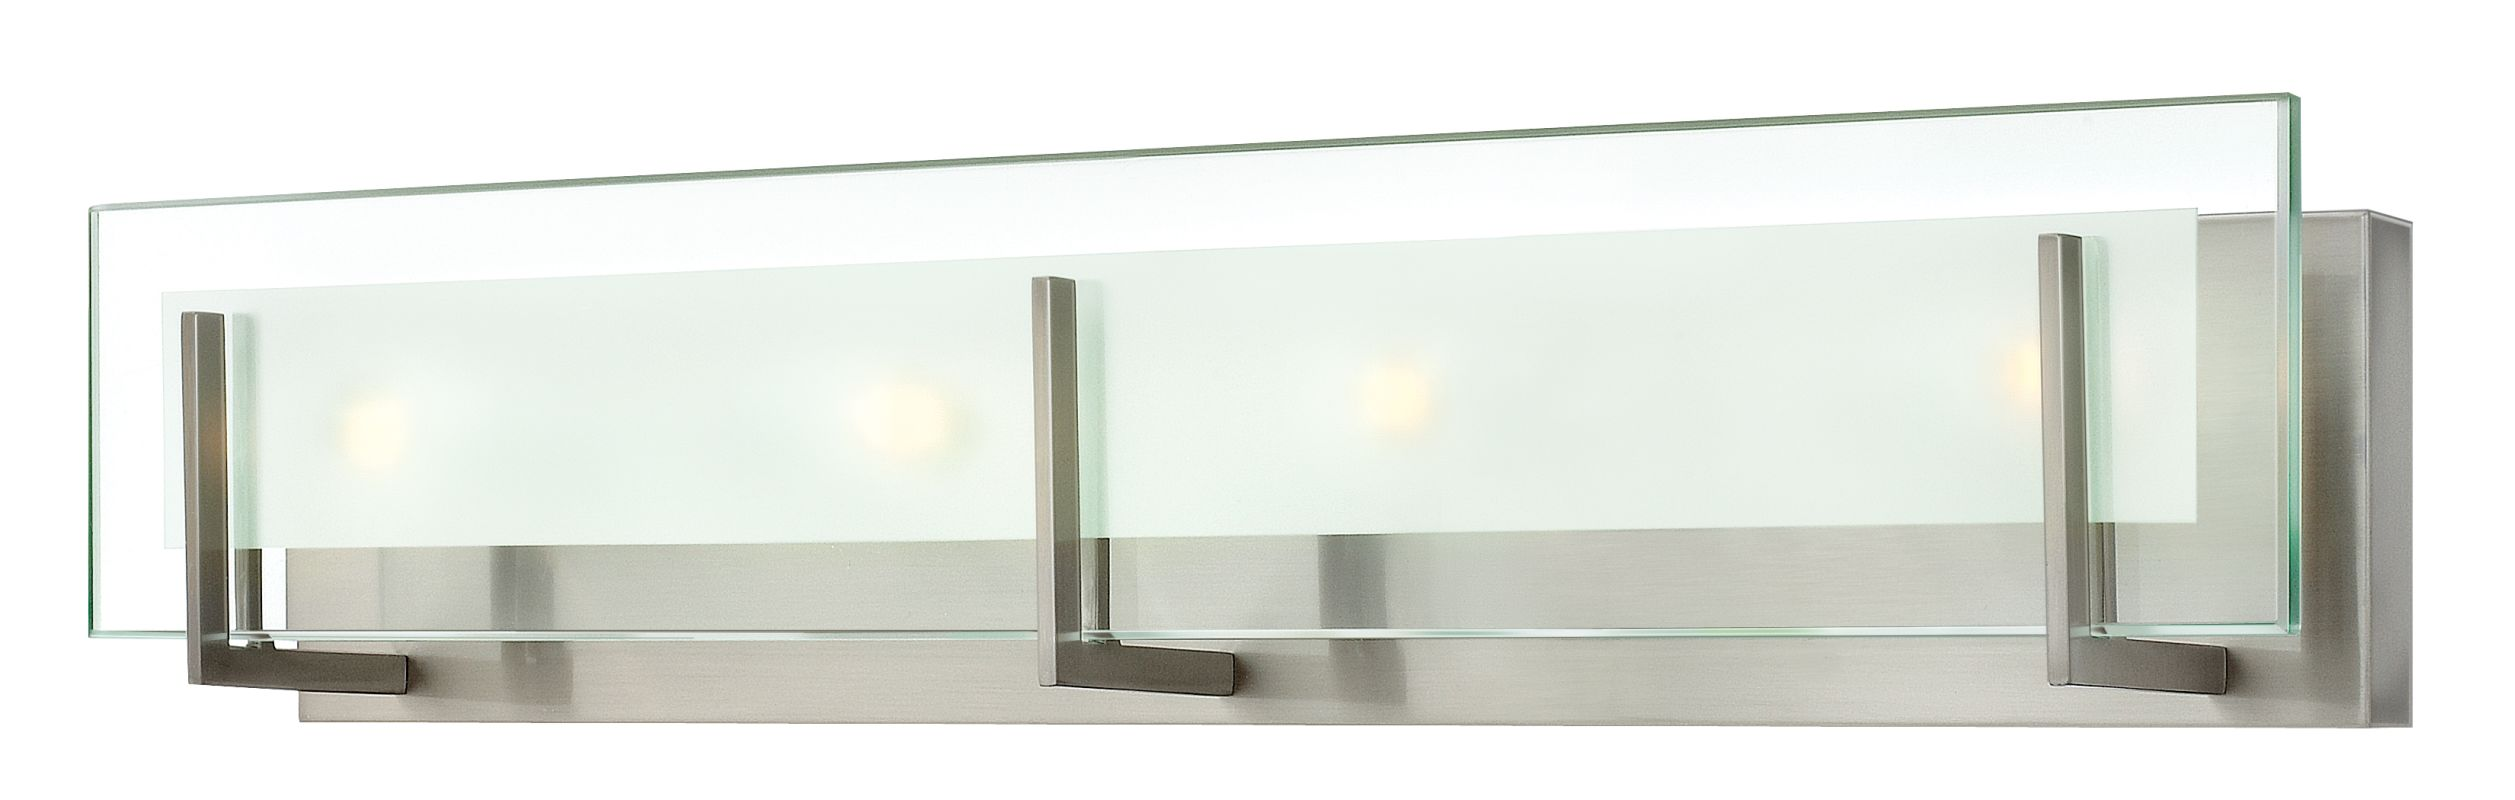 Hinkley Lighting 5654 4 Light ADA Compliant Bath Bar from the Latitude Sale $229.00 ITEM#: 1871671 MODEL# :5654BN UPC#: 640665565409 :